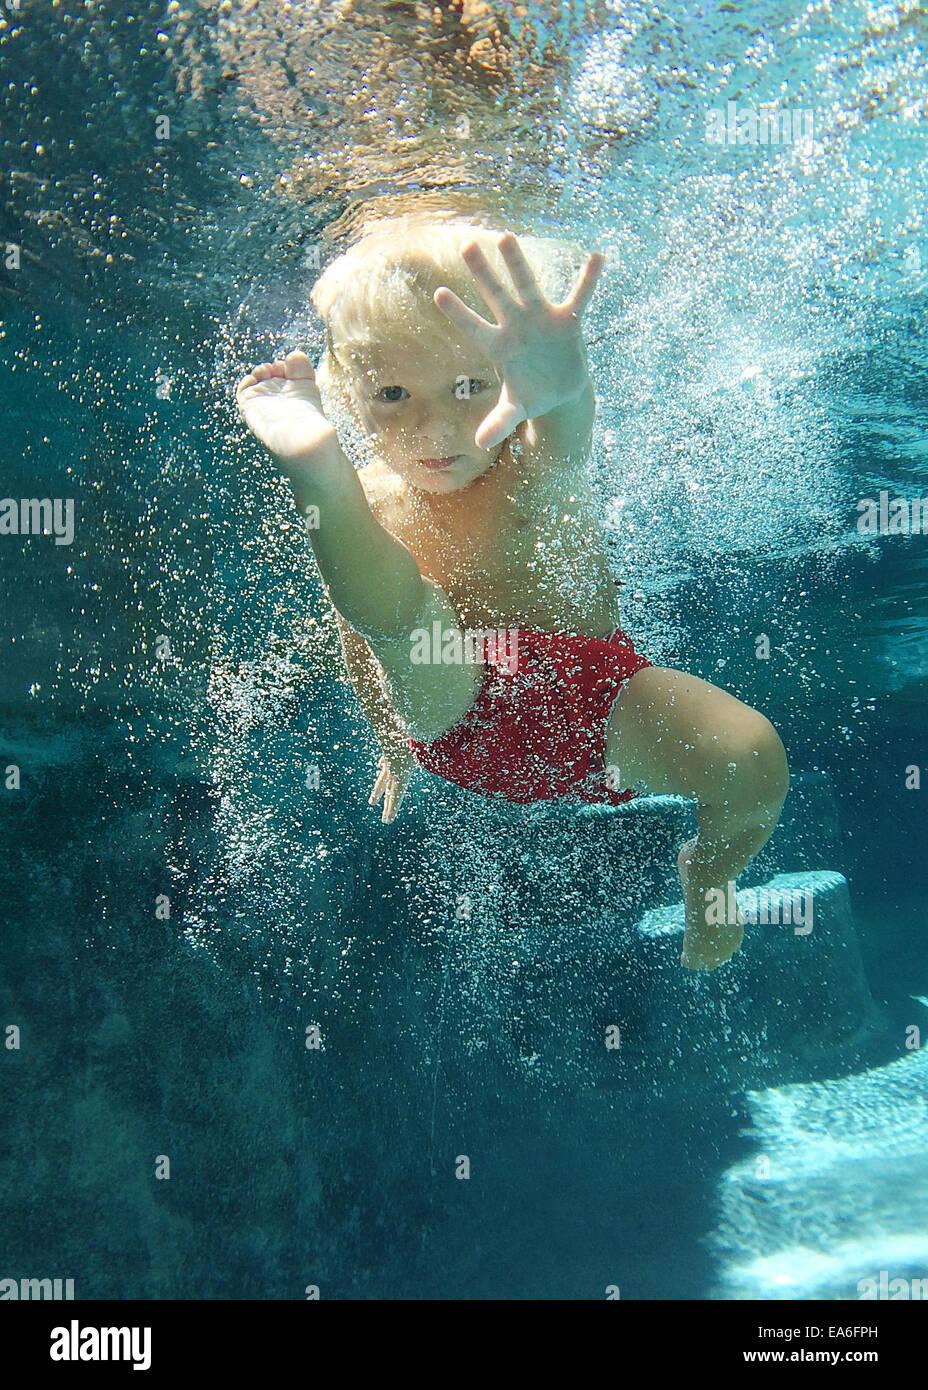 Boy swimming underwater in swimming pool Photo Stock